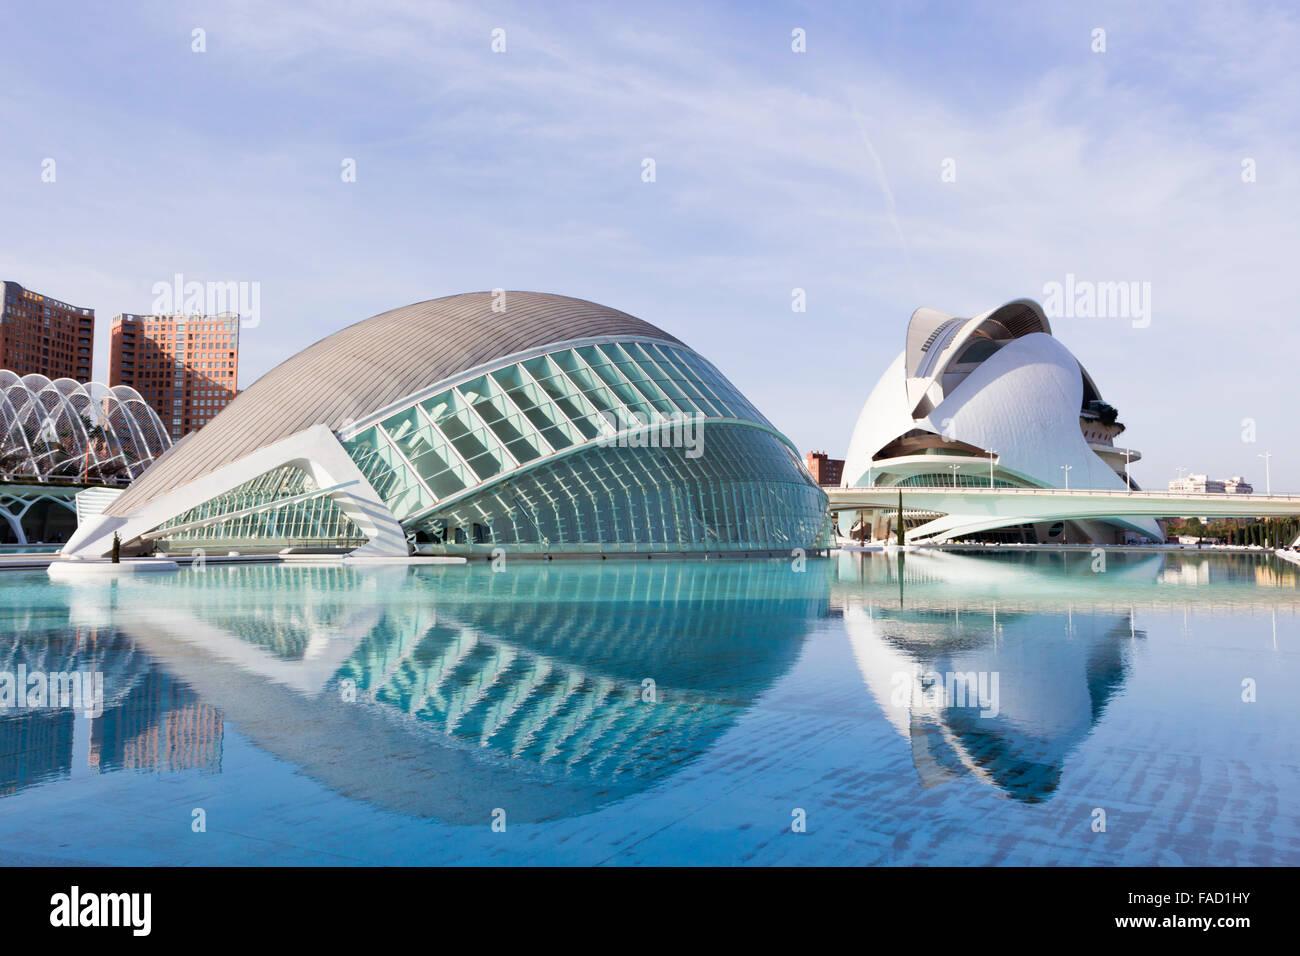 Valencia, Spain. The City of Arts and Sciences.  L'Hemisfèric.  El Palau de les Arts Reina Sofia in the - Stock Image